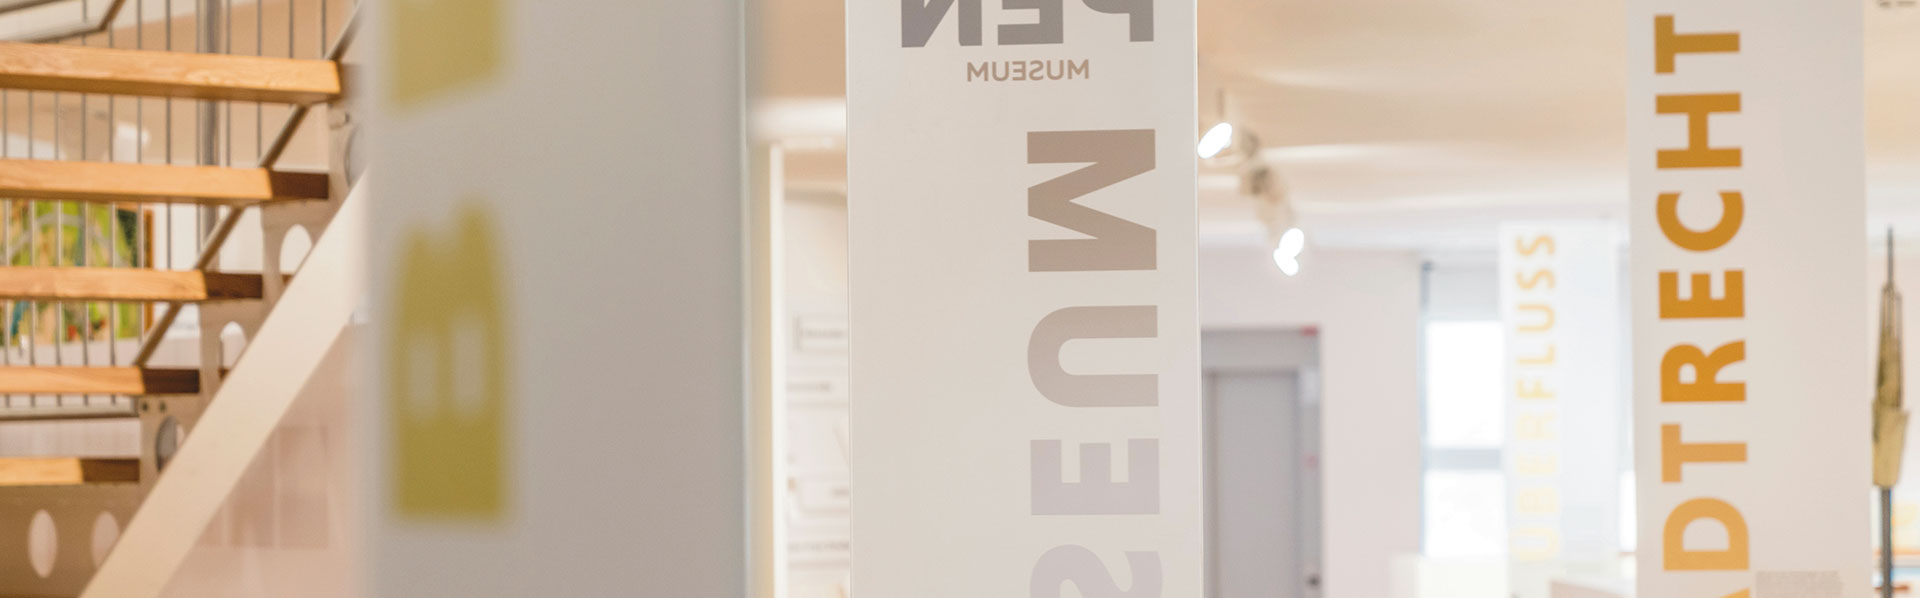 Stadtmuseum Über uns